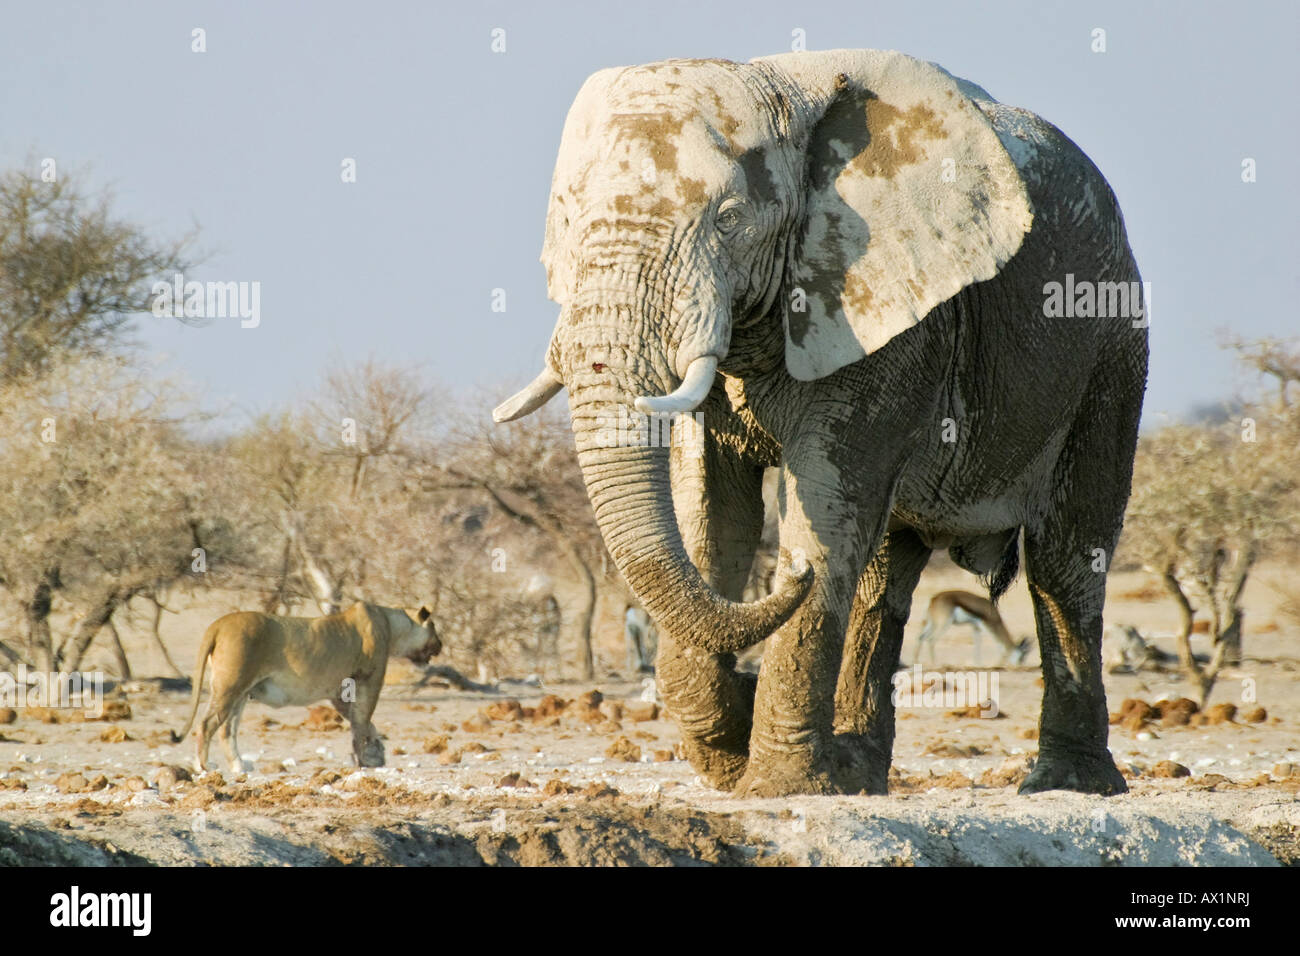 African Elephant (Loxodonta africana) and lionness (Panthera leo), Nxai Pan, Makgadikgadi Pans National Park, Botswana, Stock Photo